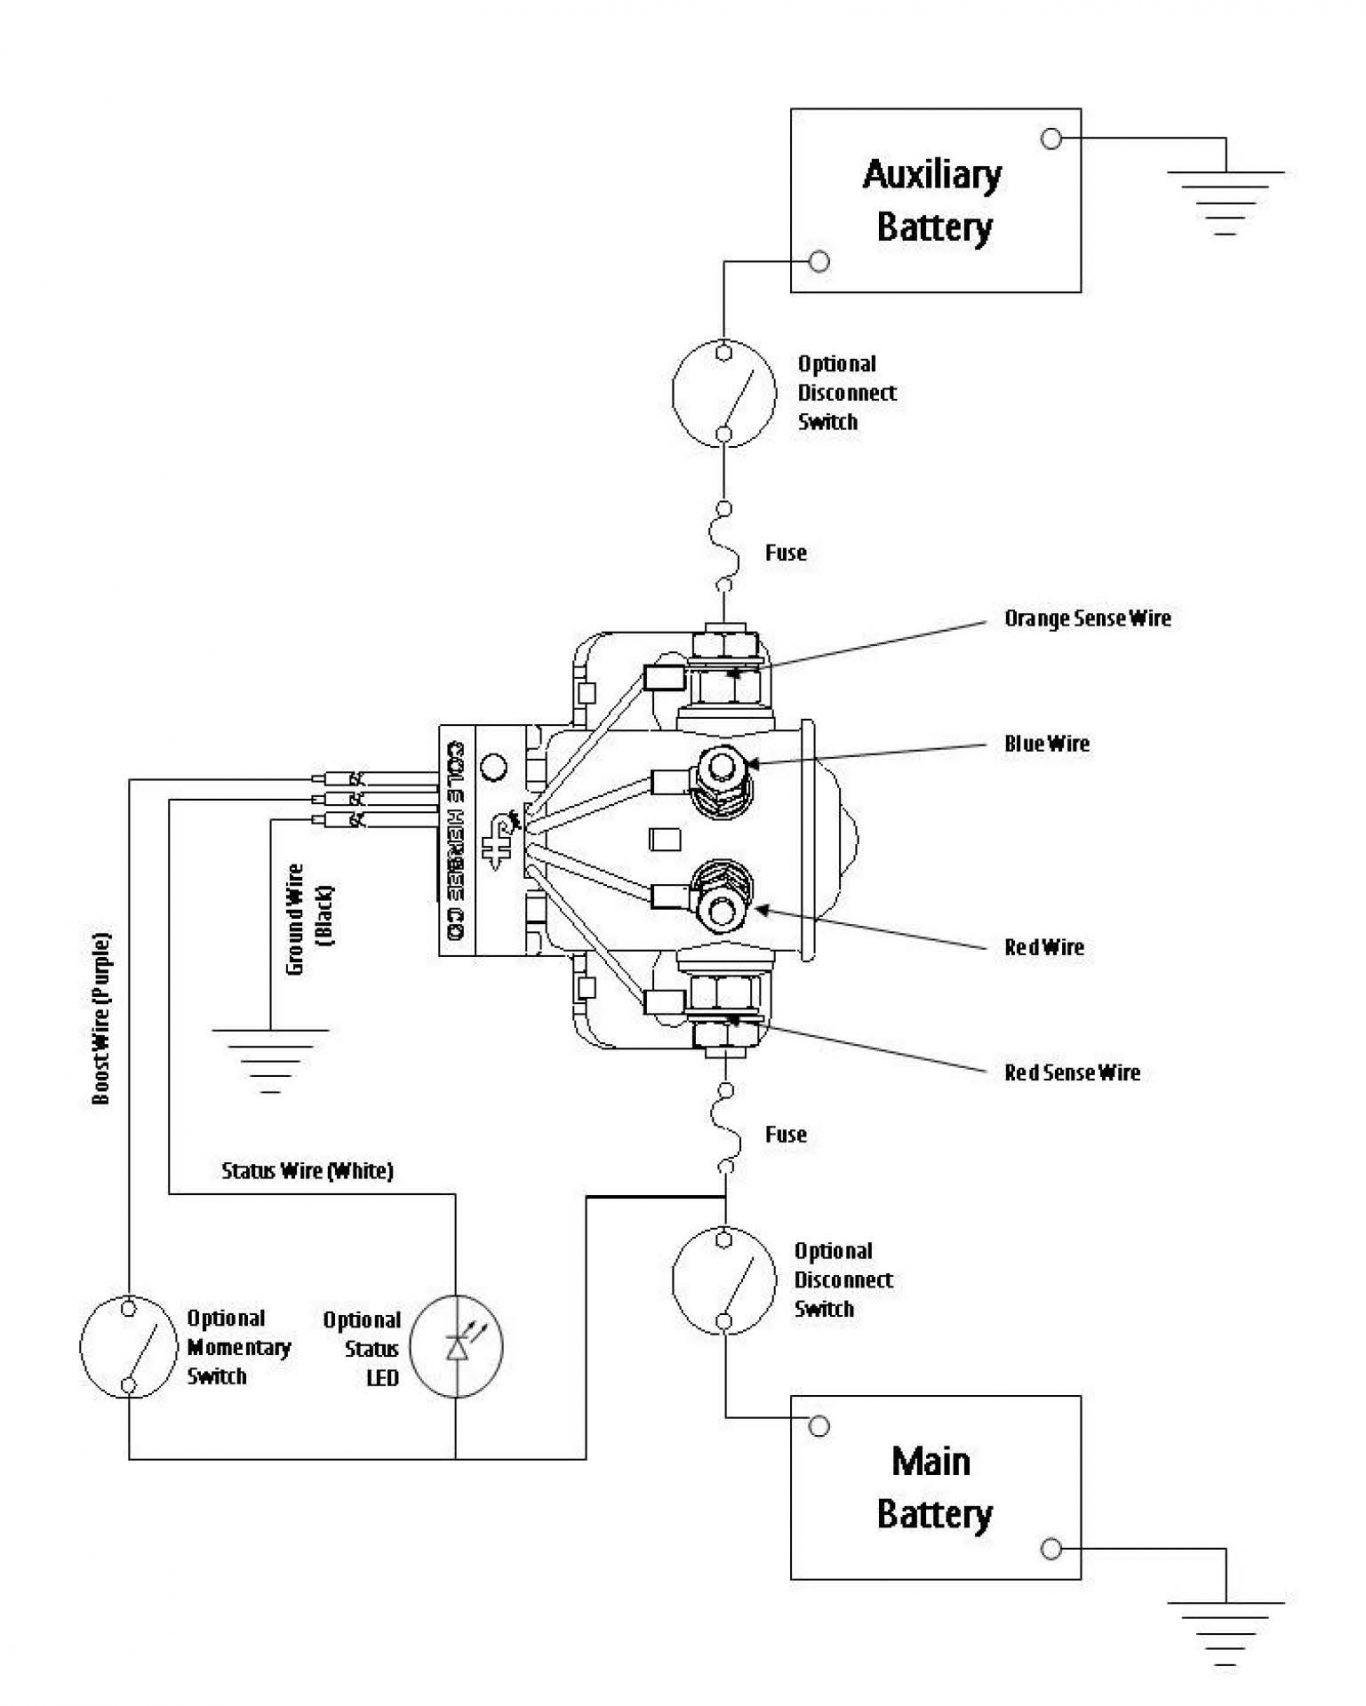 Atv Wire Diagram for Winch Motor Aw 0401] 12 Volt Winch Switch Wiring Of Atv Wire Diagram for Winch Motor